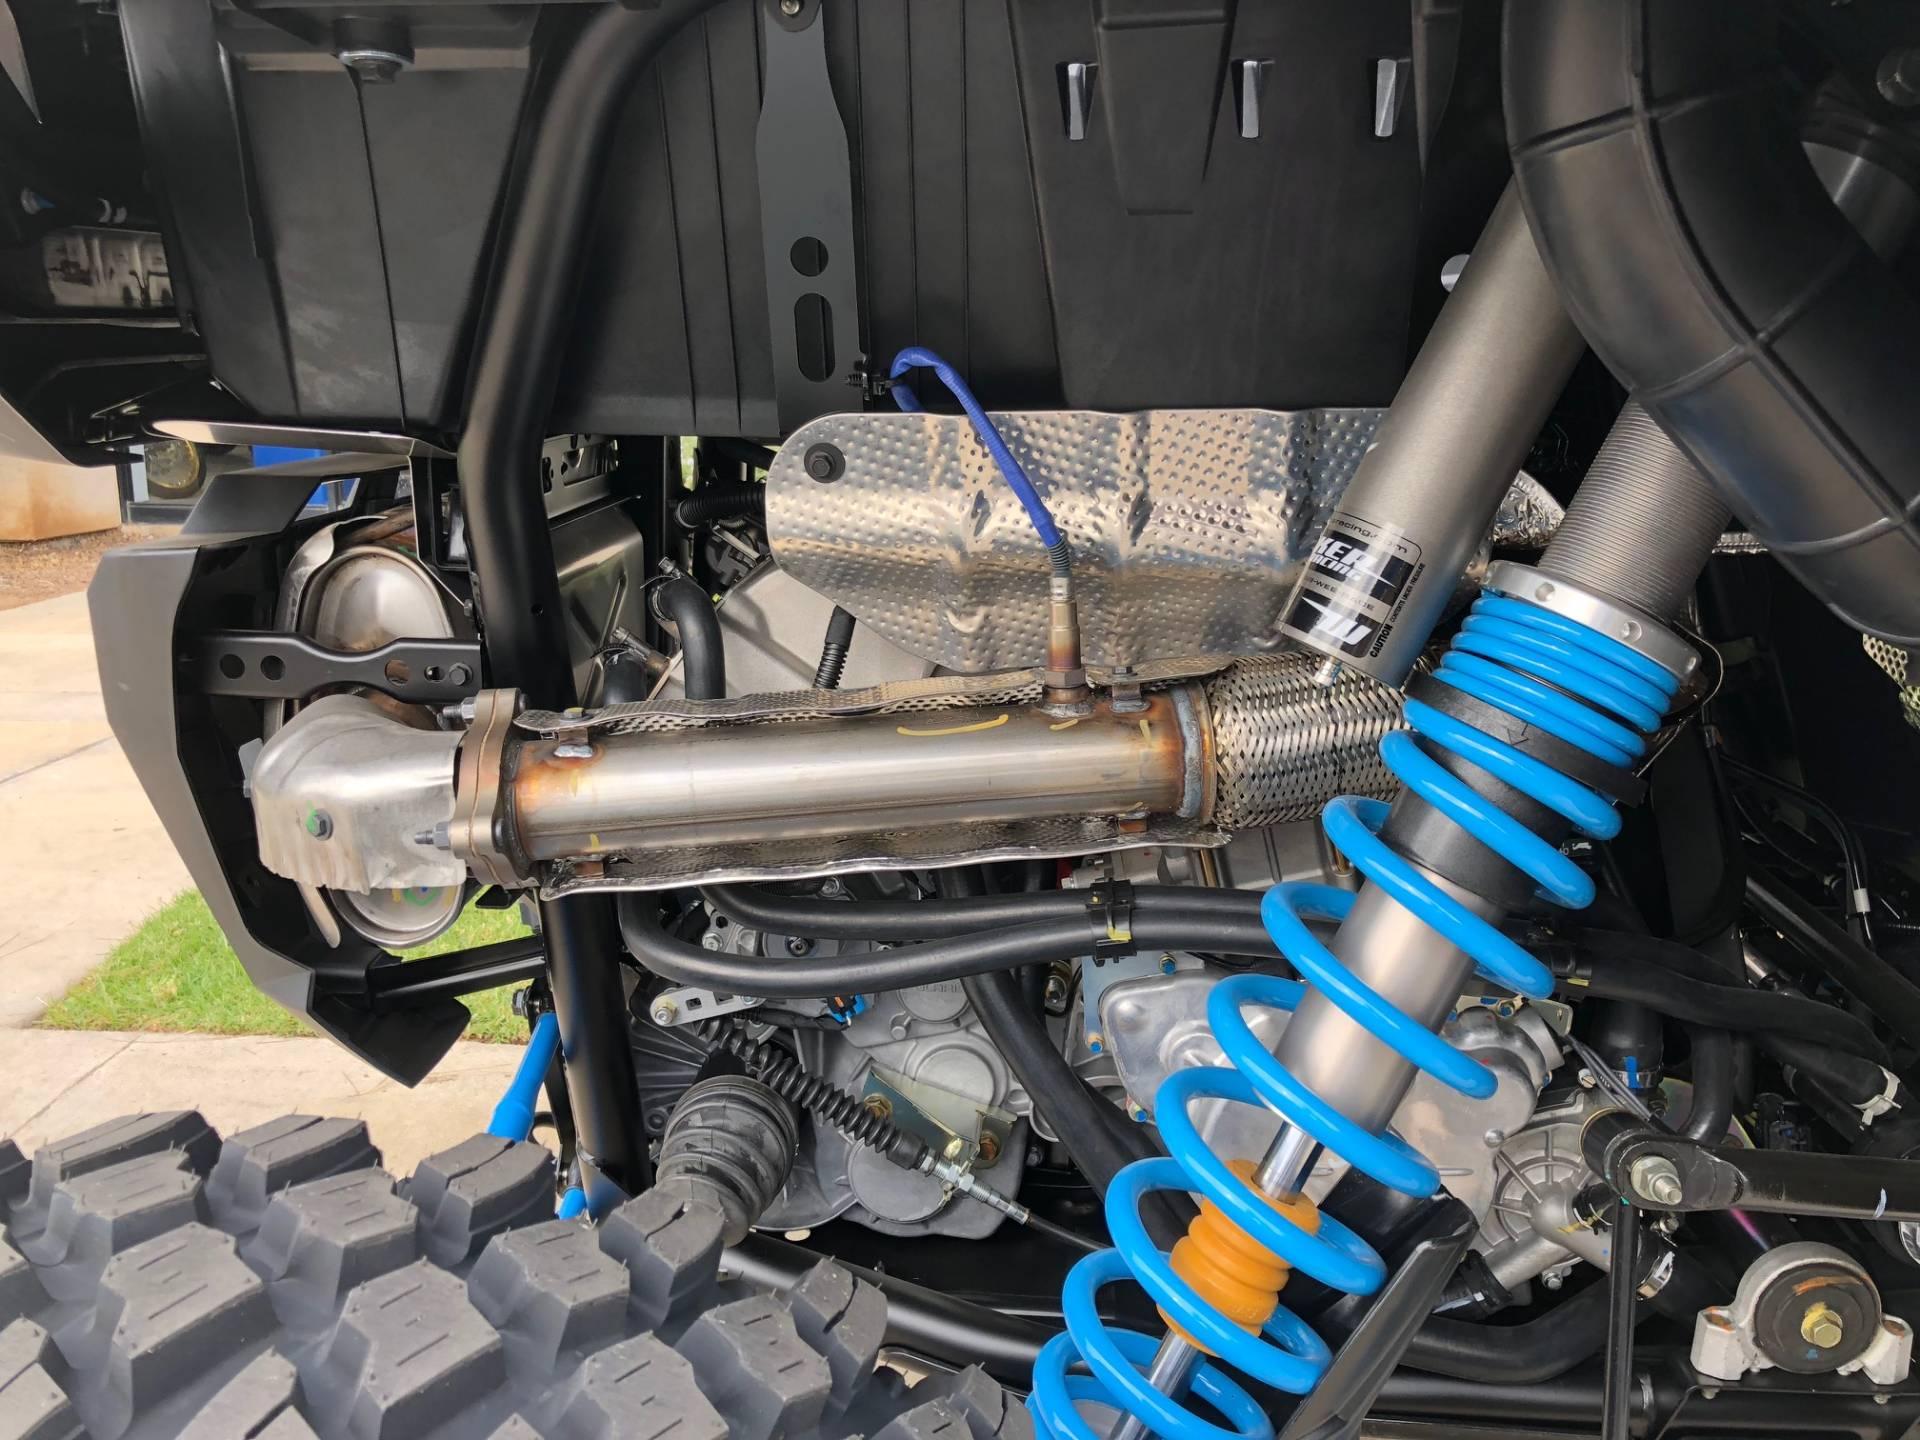 2019 Polaris RZR XP 4 Turbo 11